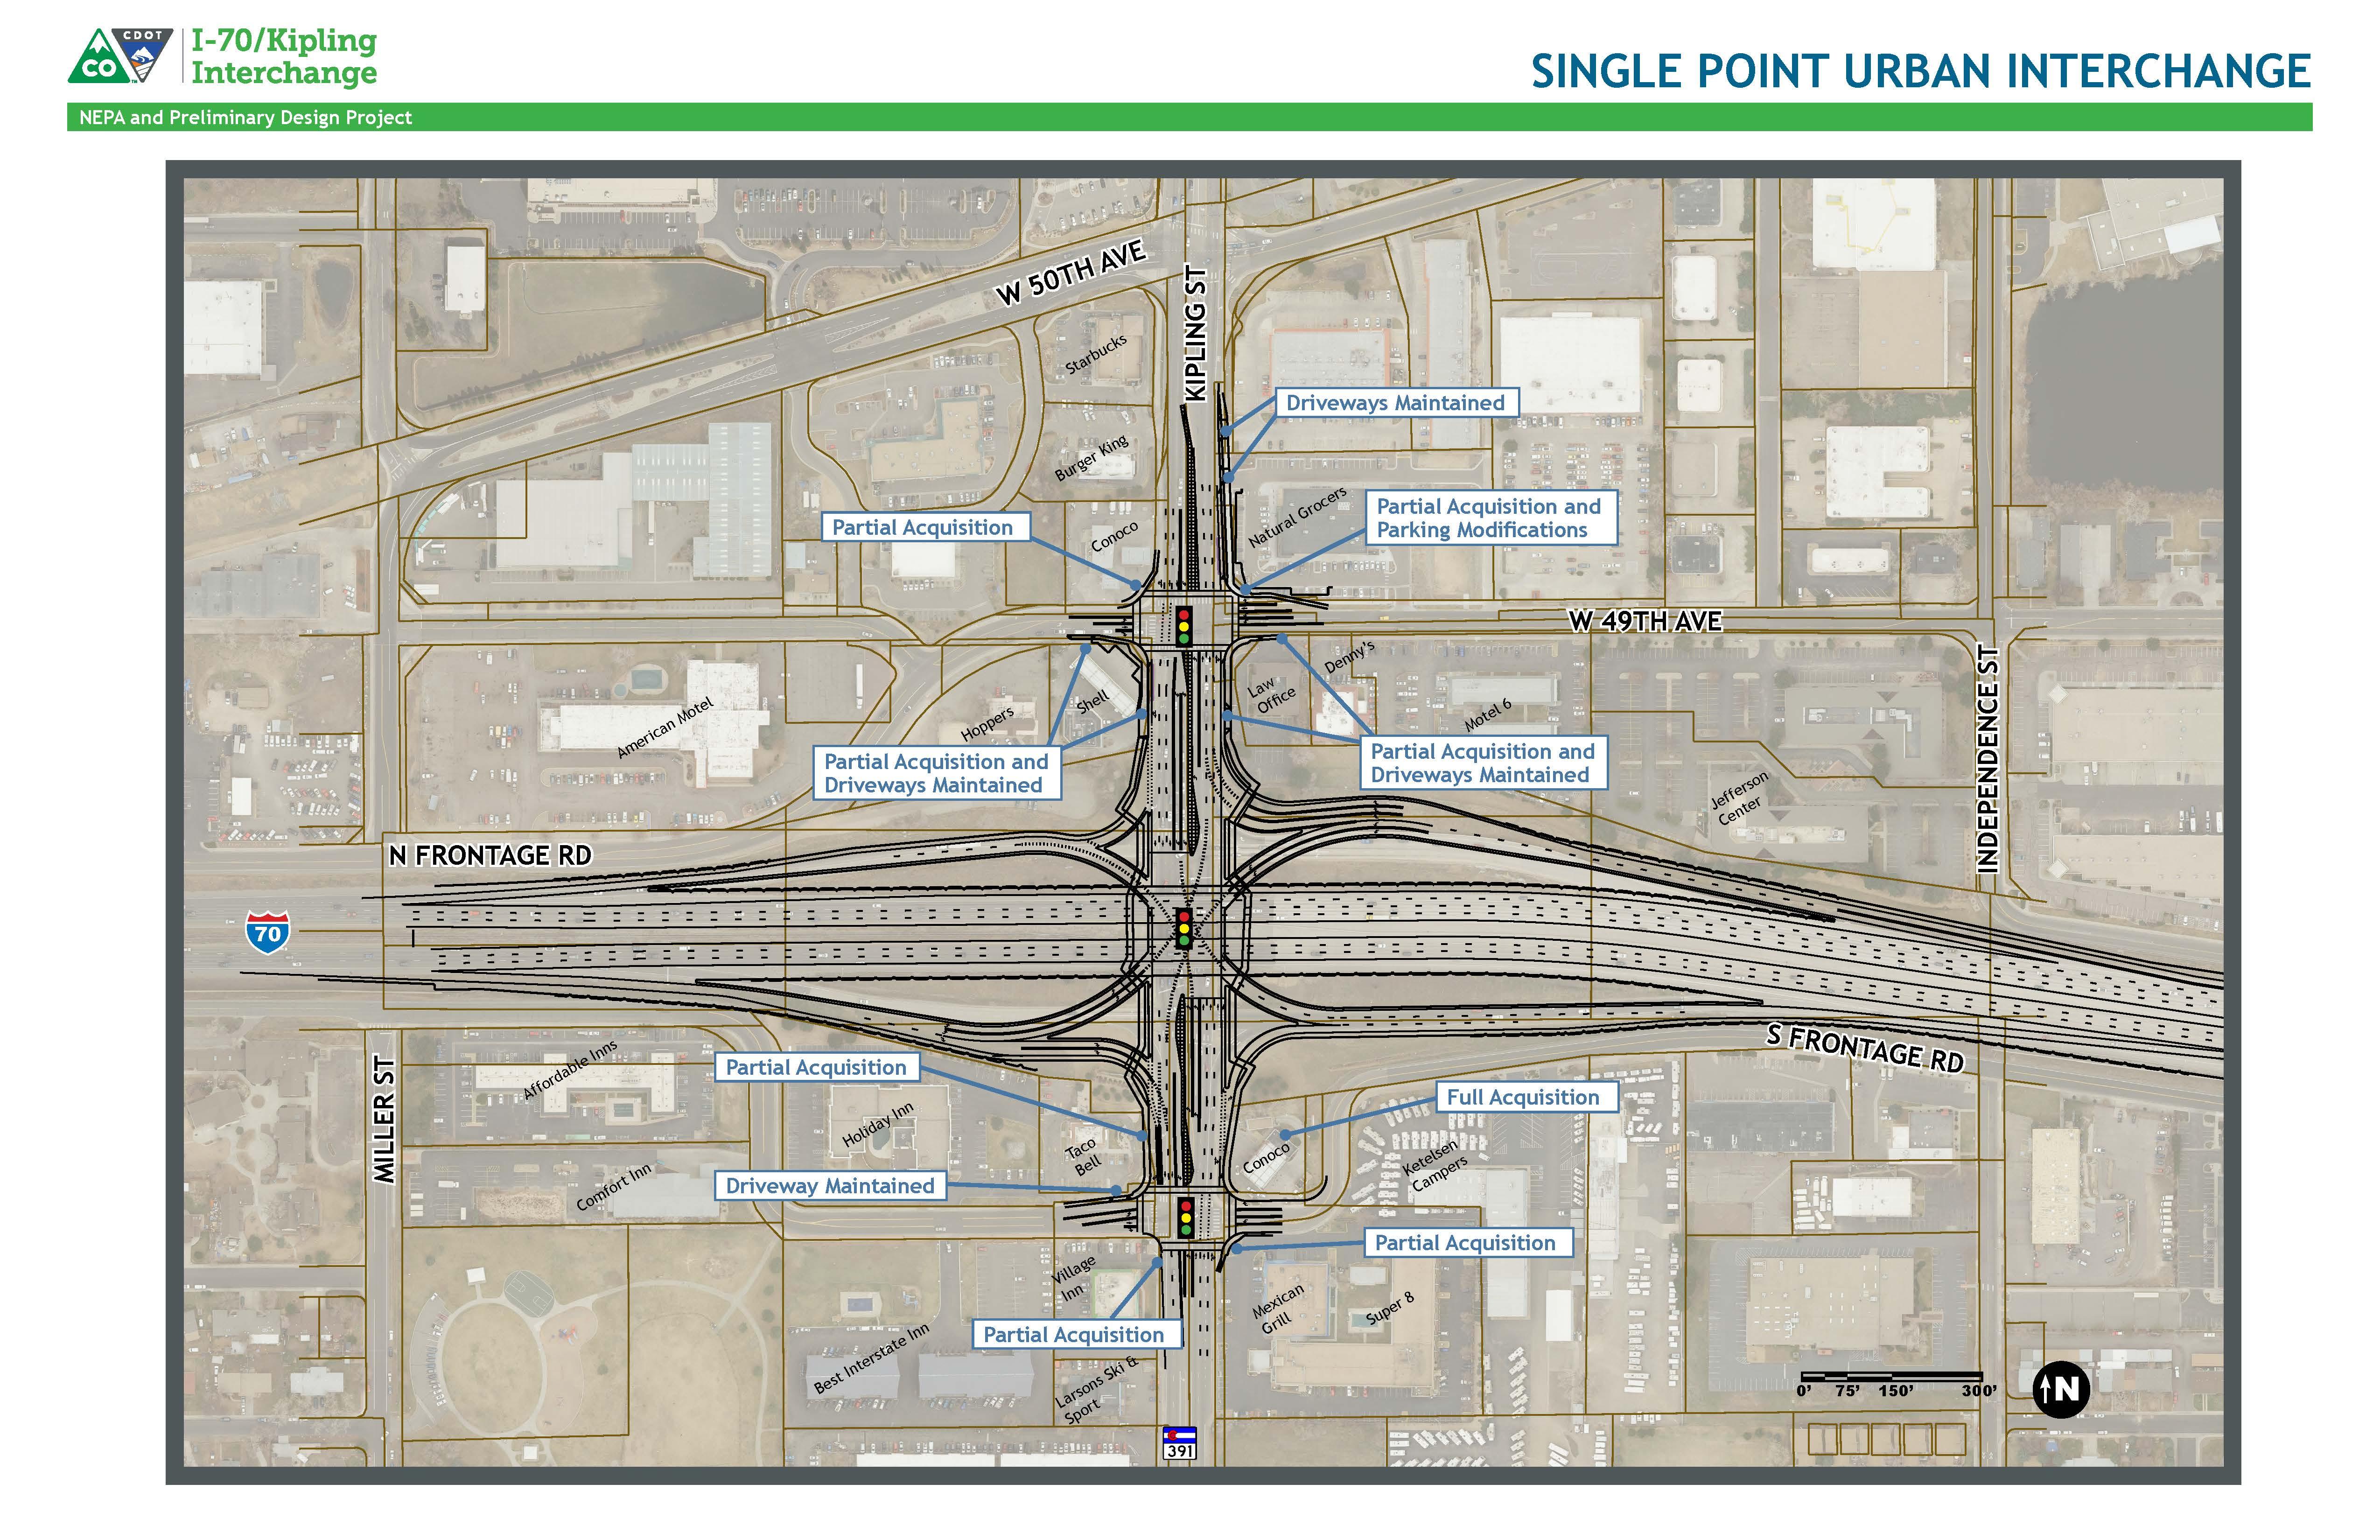 Single Point Urban Interchange